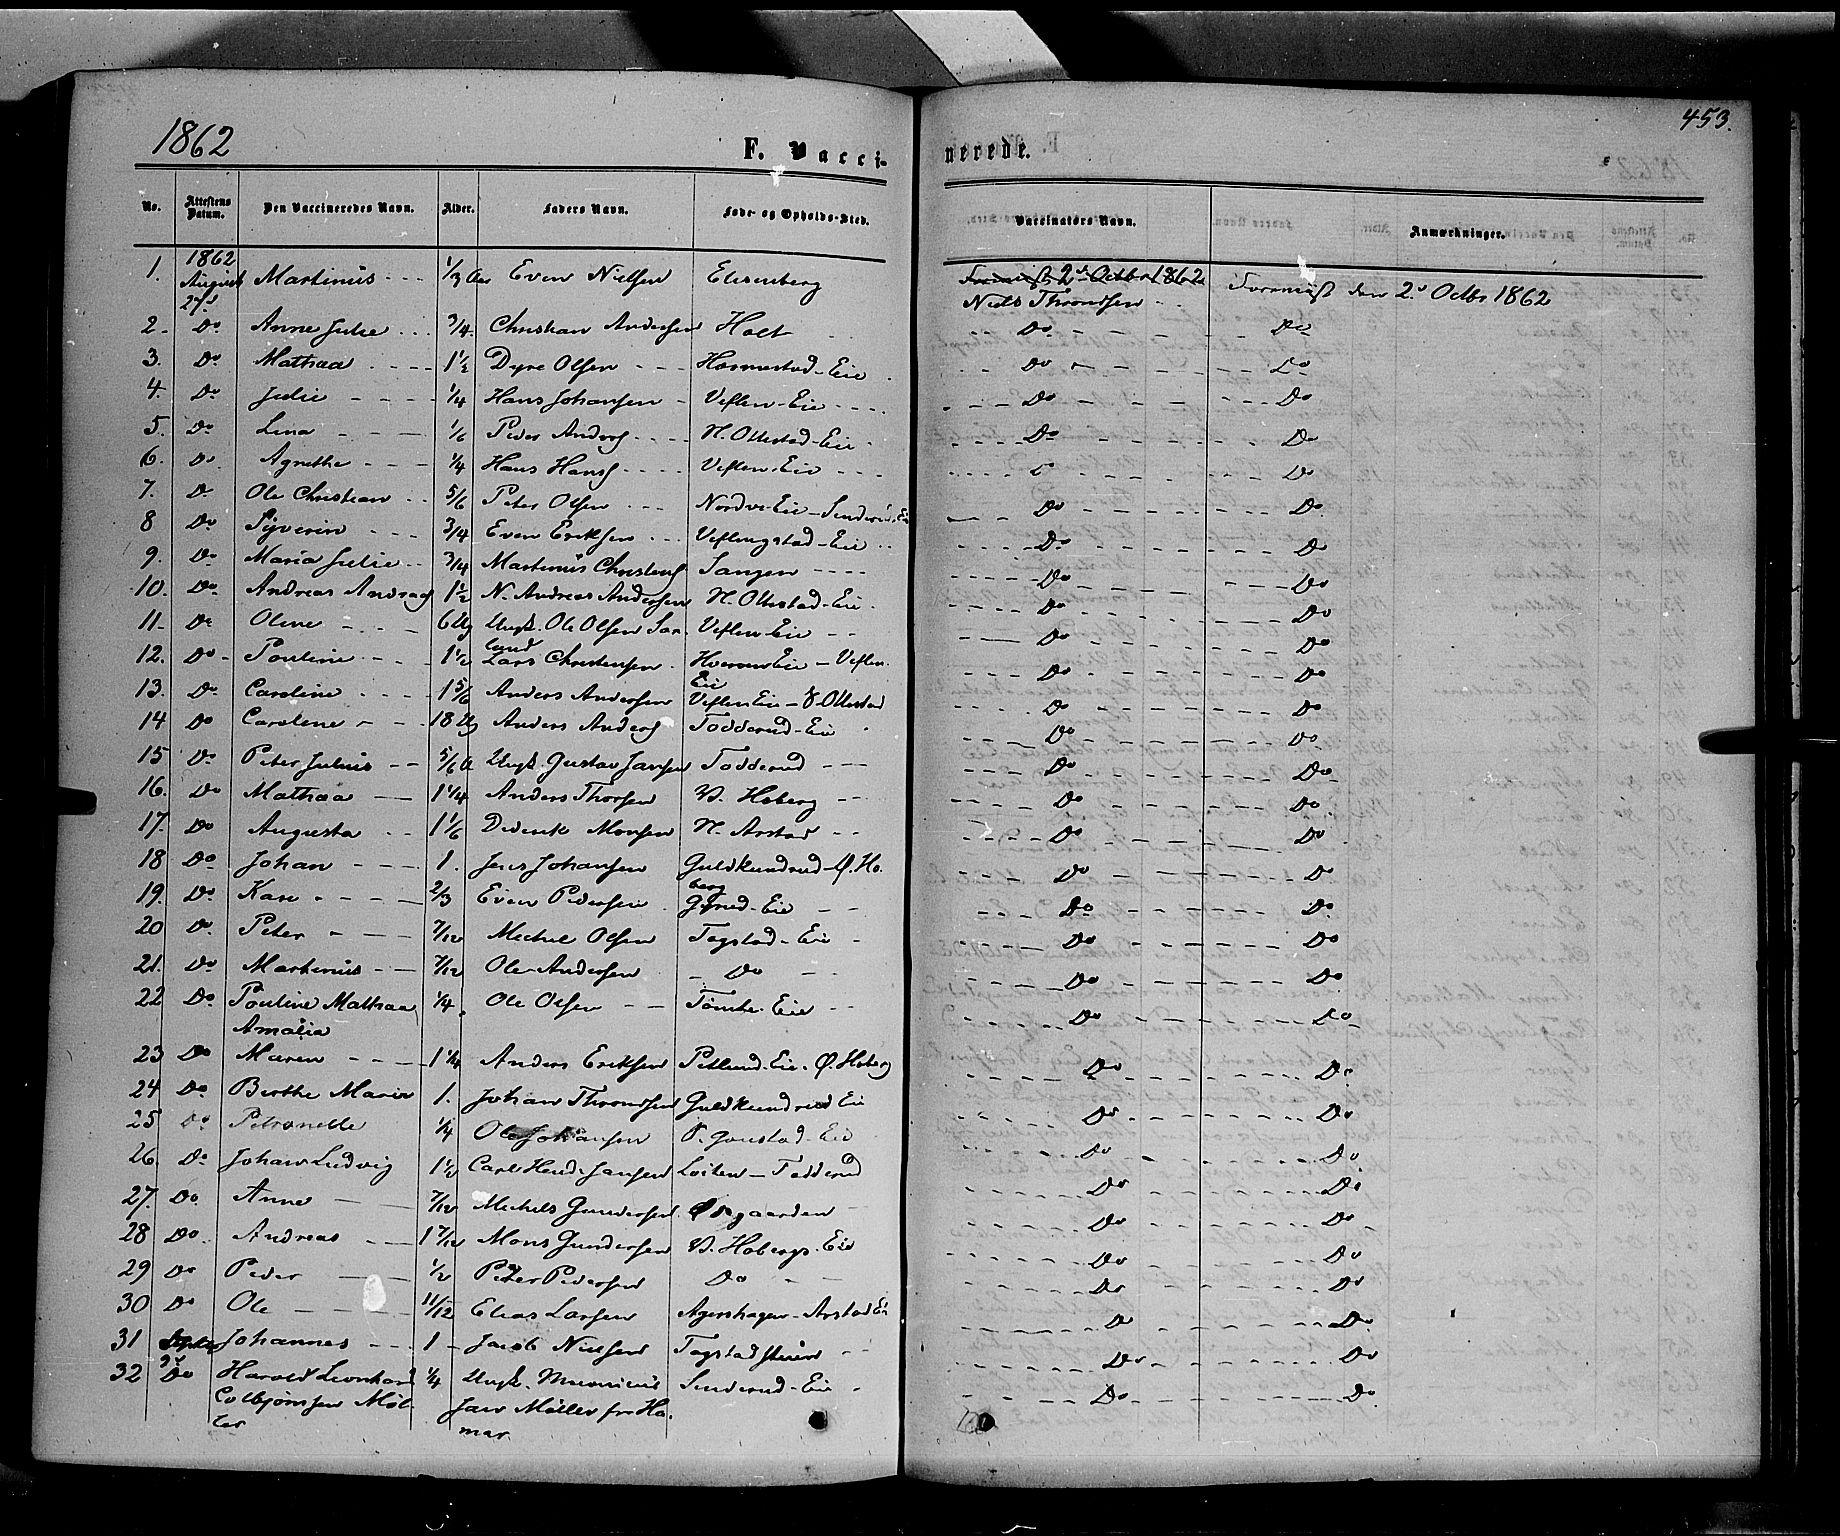 SAH, Stange prestekontor, K/L0013: Ministerialbok nr. 13, 1862-1879, s. 453